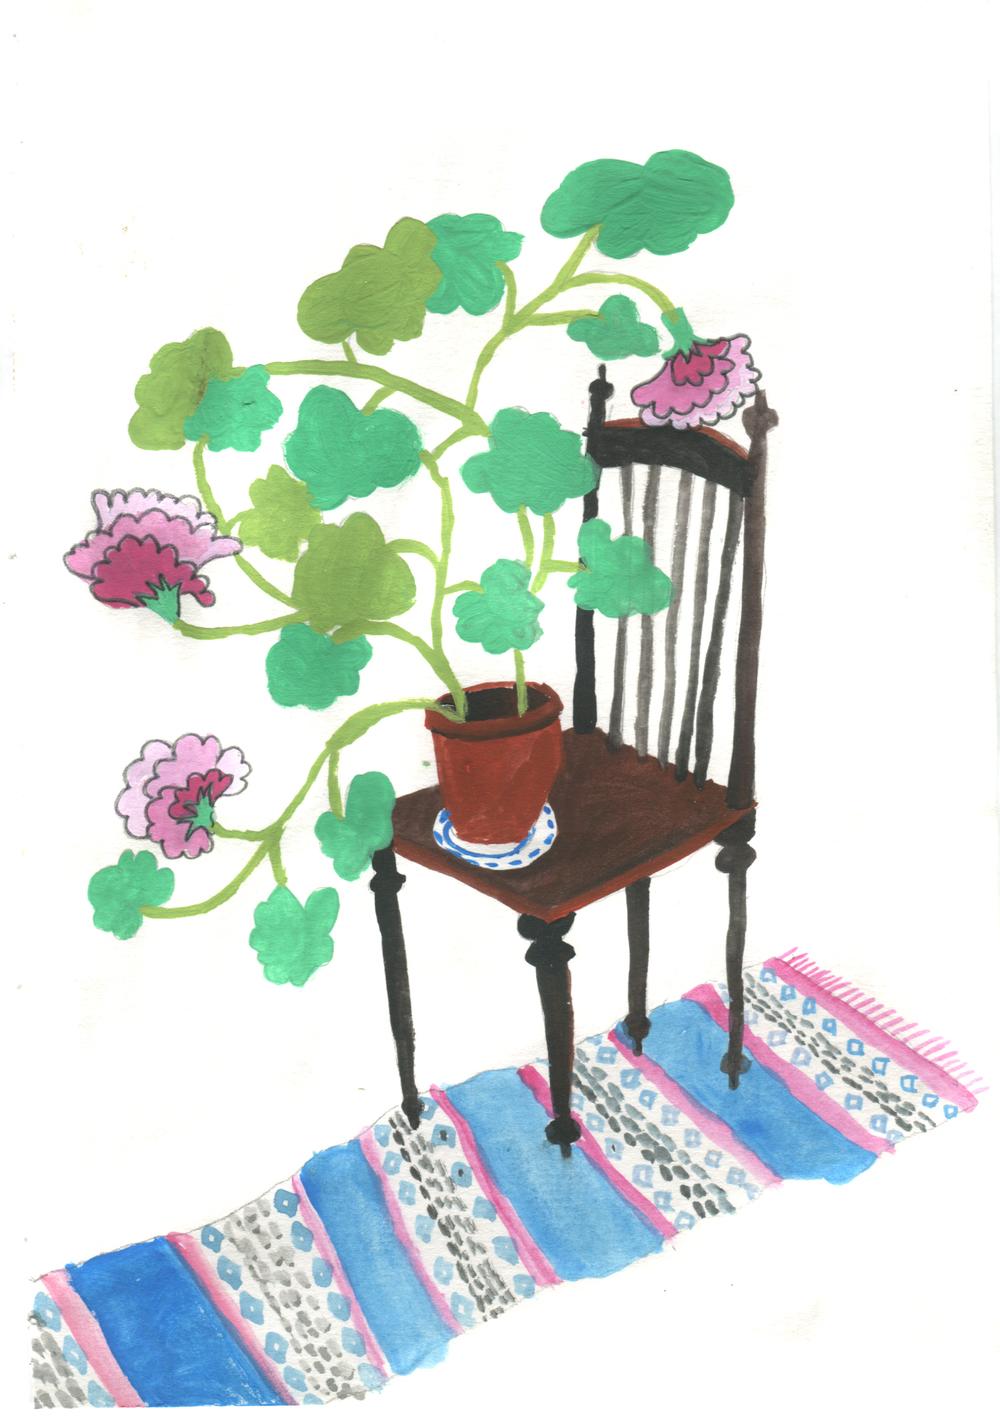 Plant on chair, gouache on paper, 14,5 x 21 cm, 2016